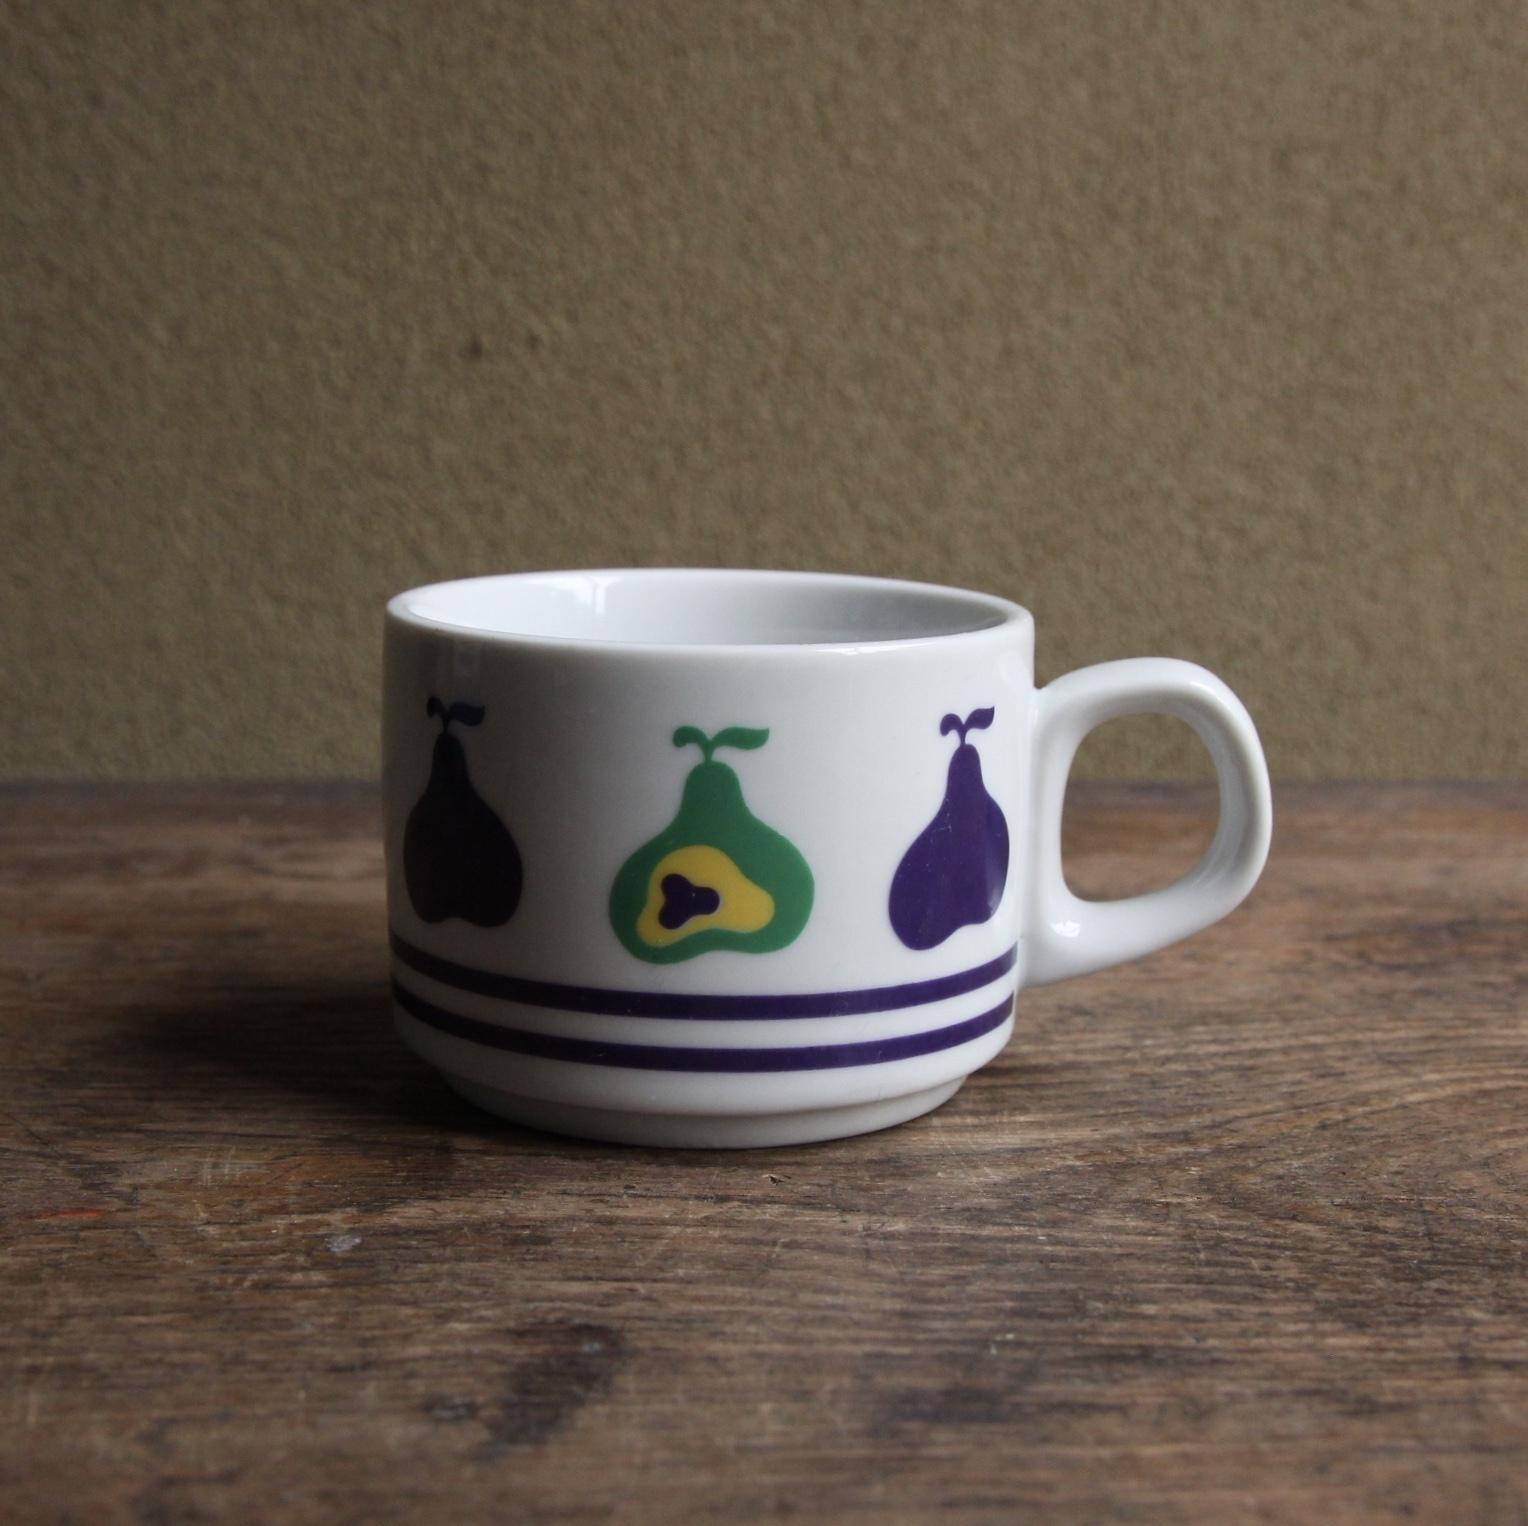 NT ノリタケ 洋梨のカップ 在庫2客